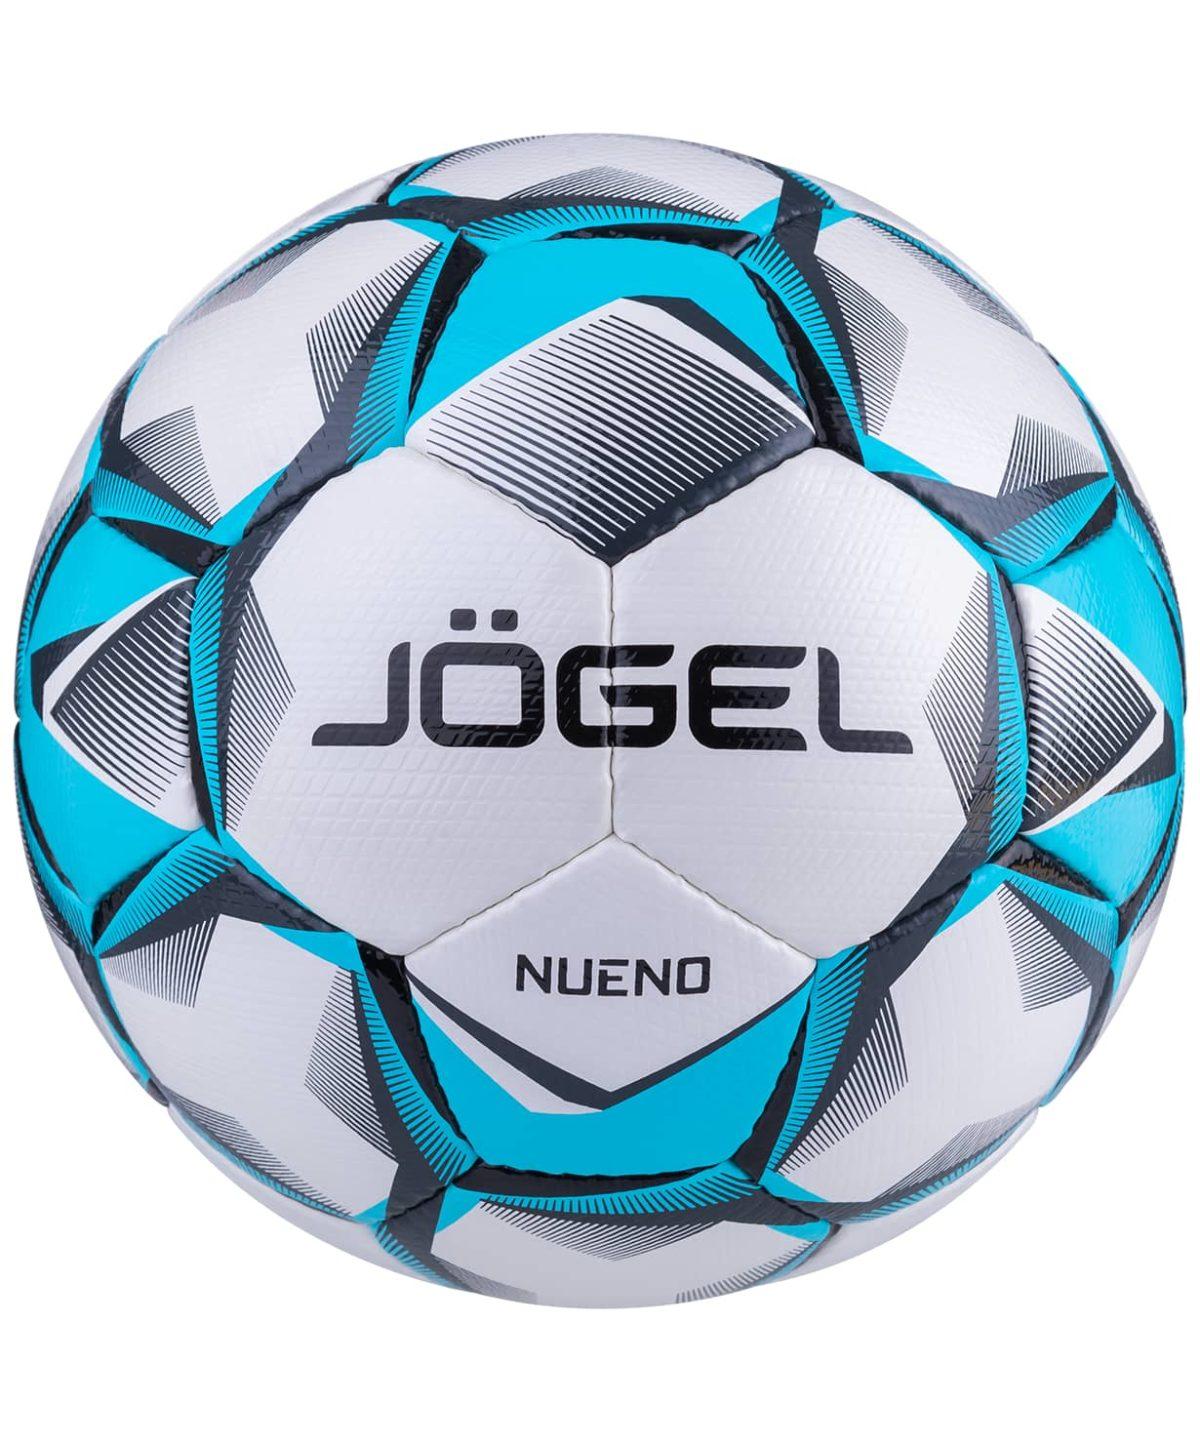 JOGEL Nueno Мяч футбольный  Nueno №5 (BC-20) - 1